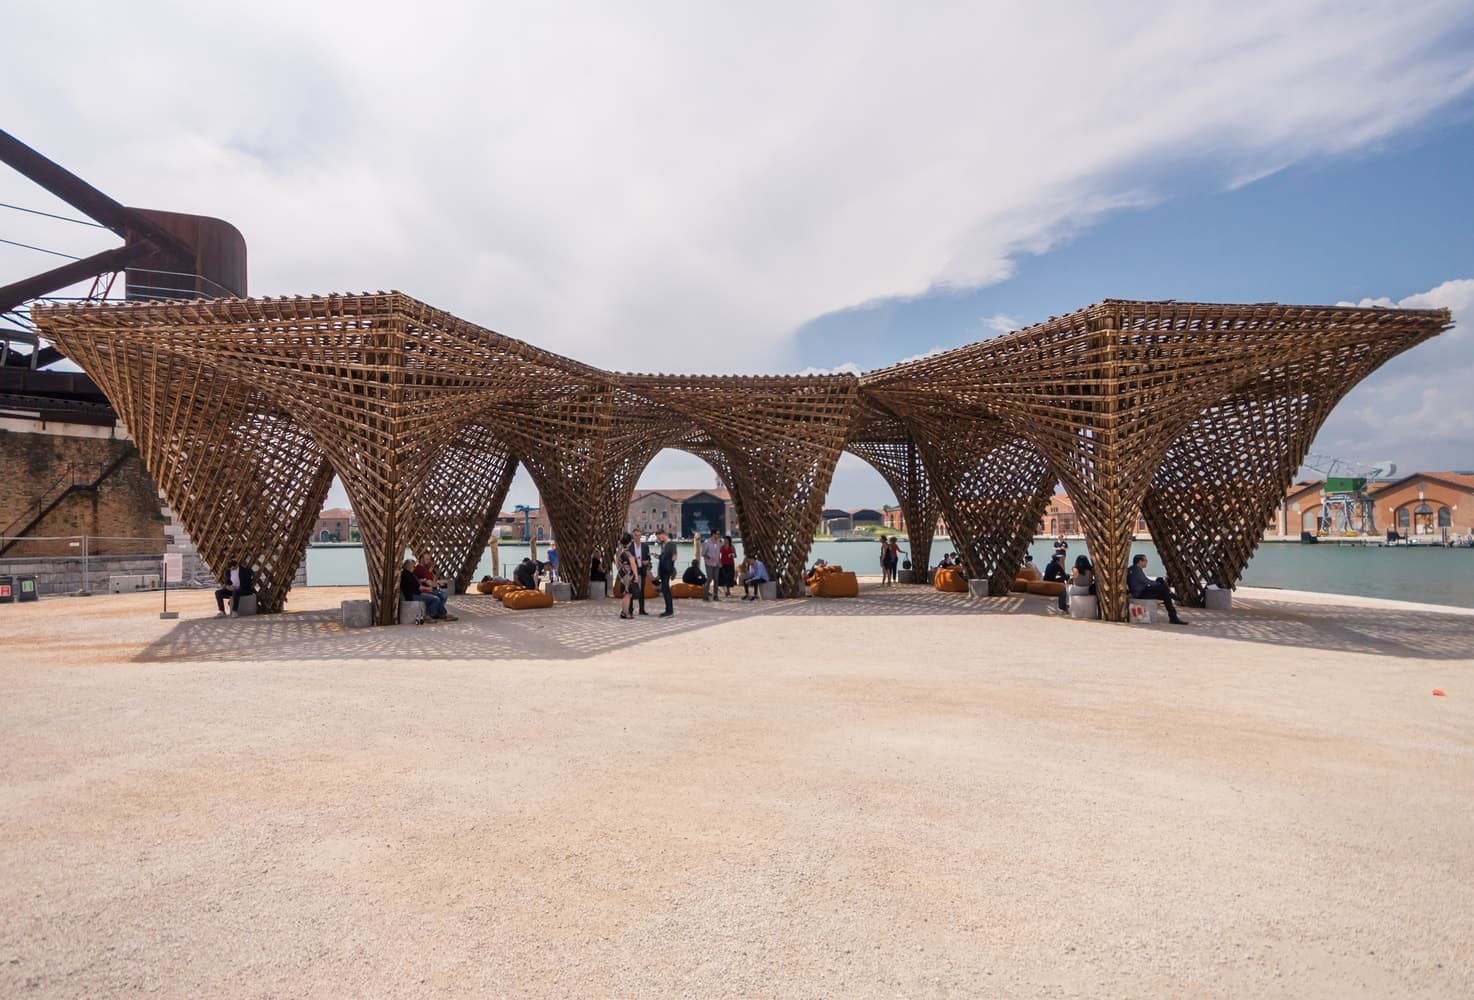 VTN Bamboo Stalactite auf der Biennale di Venezia 2018